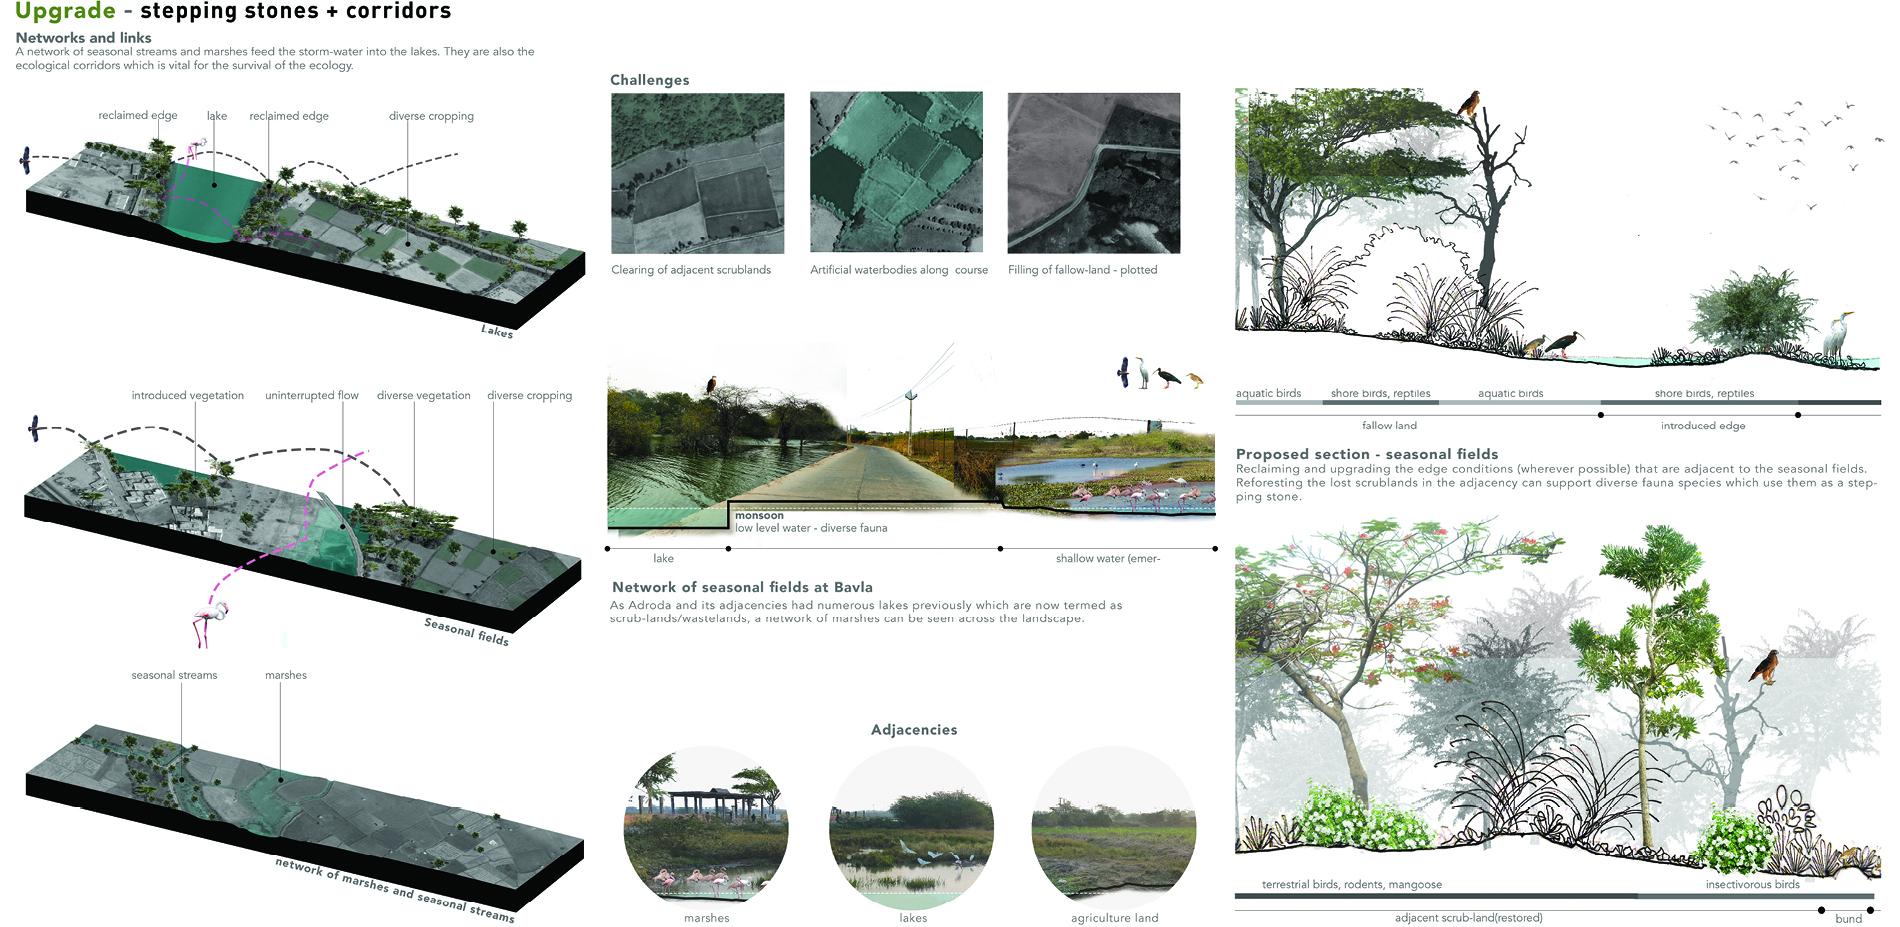 Upgrade - stepping stones + corridors